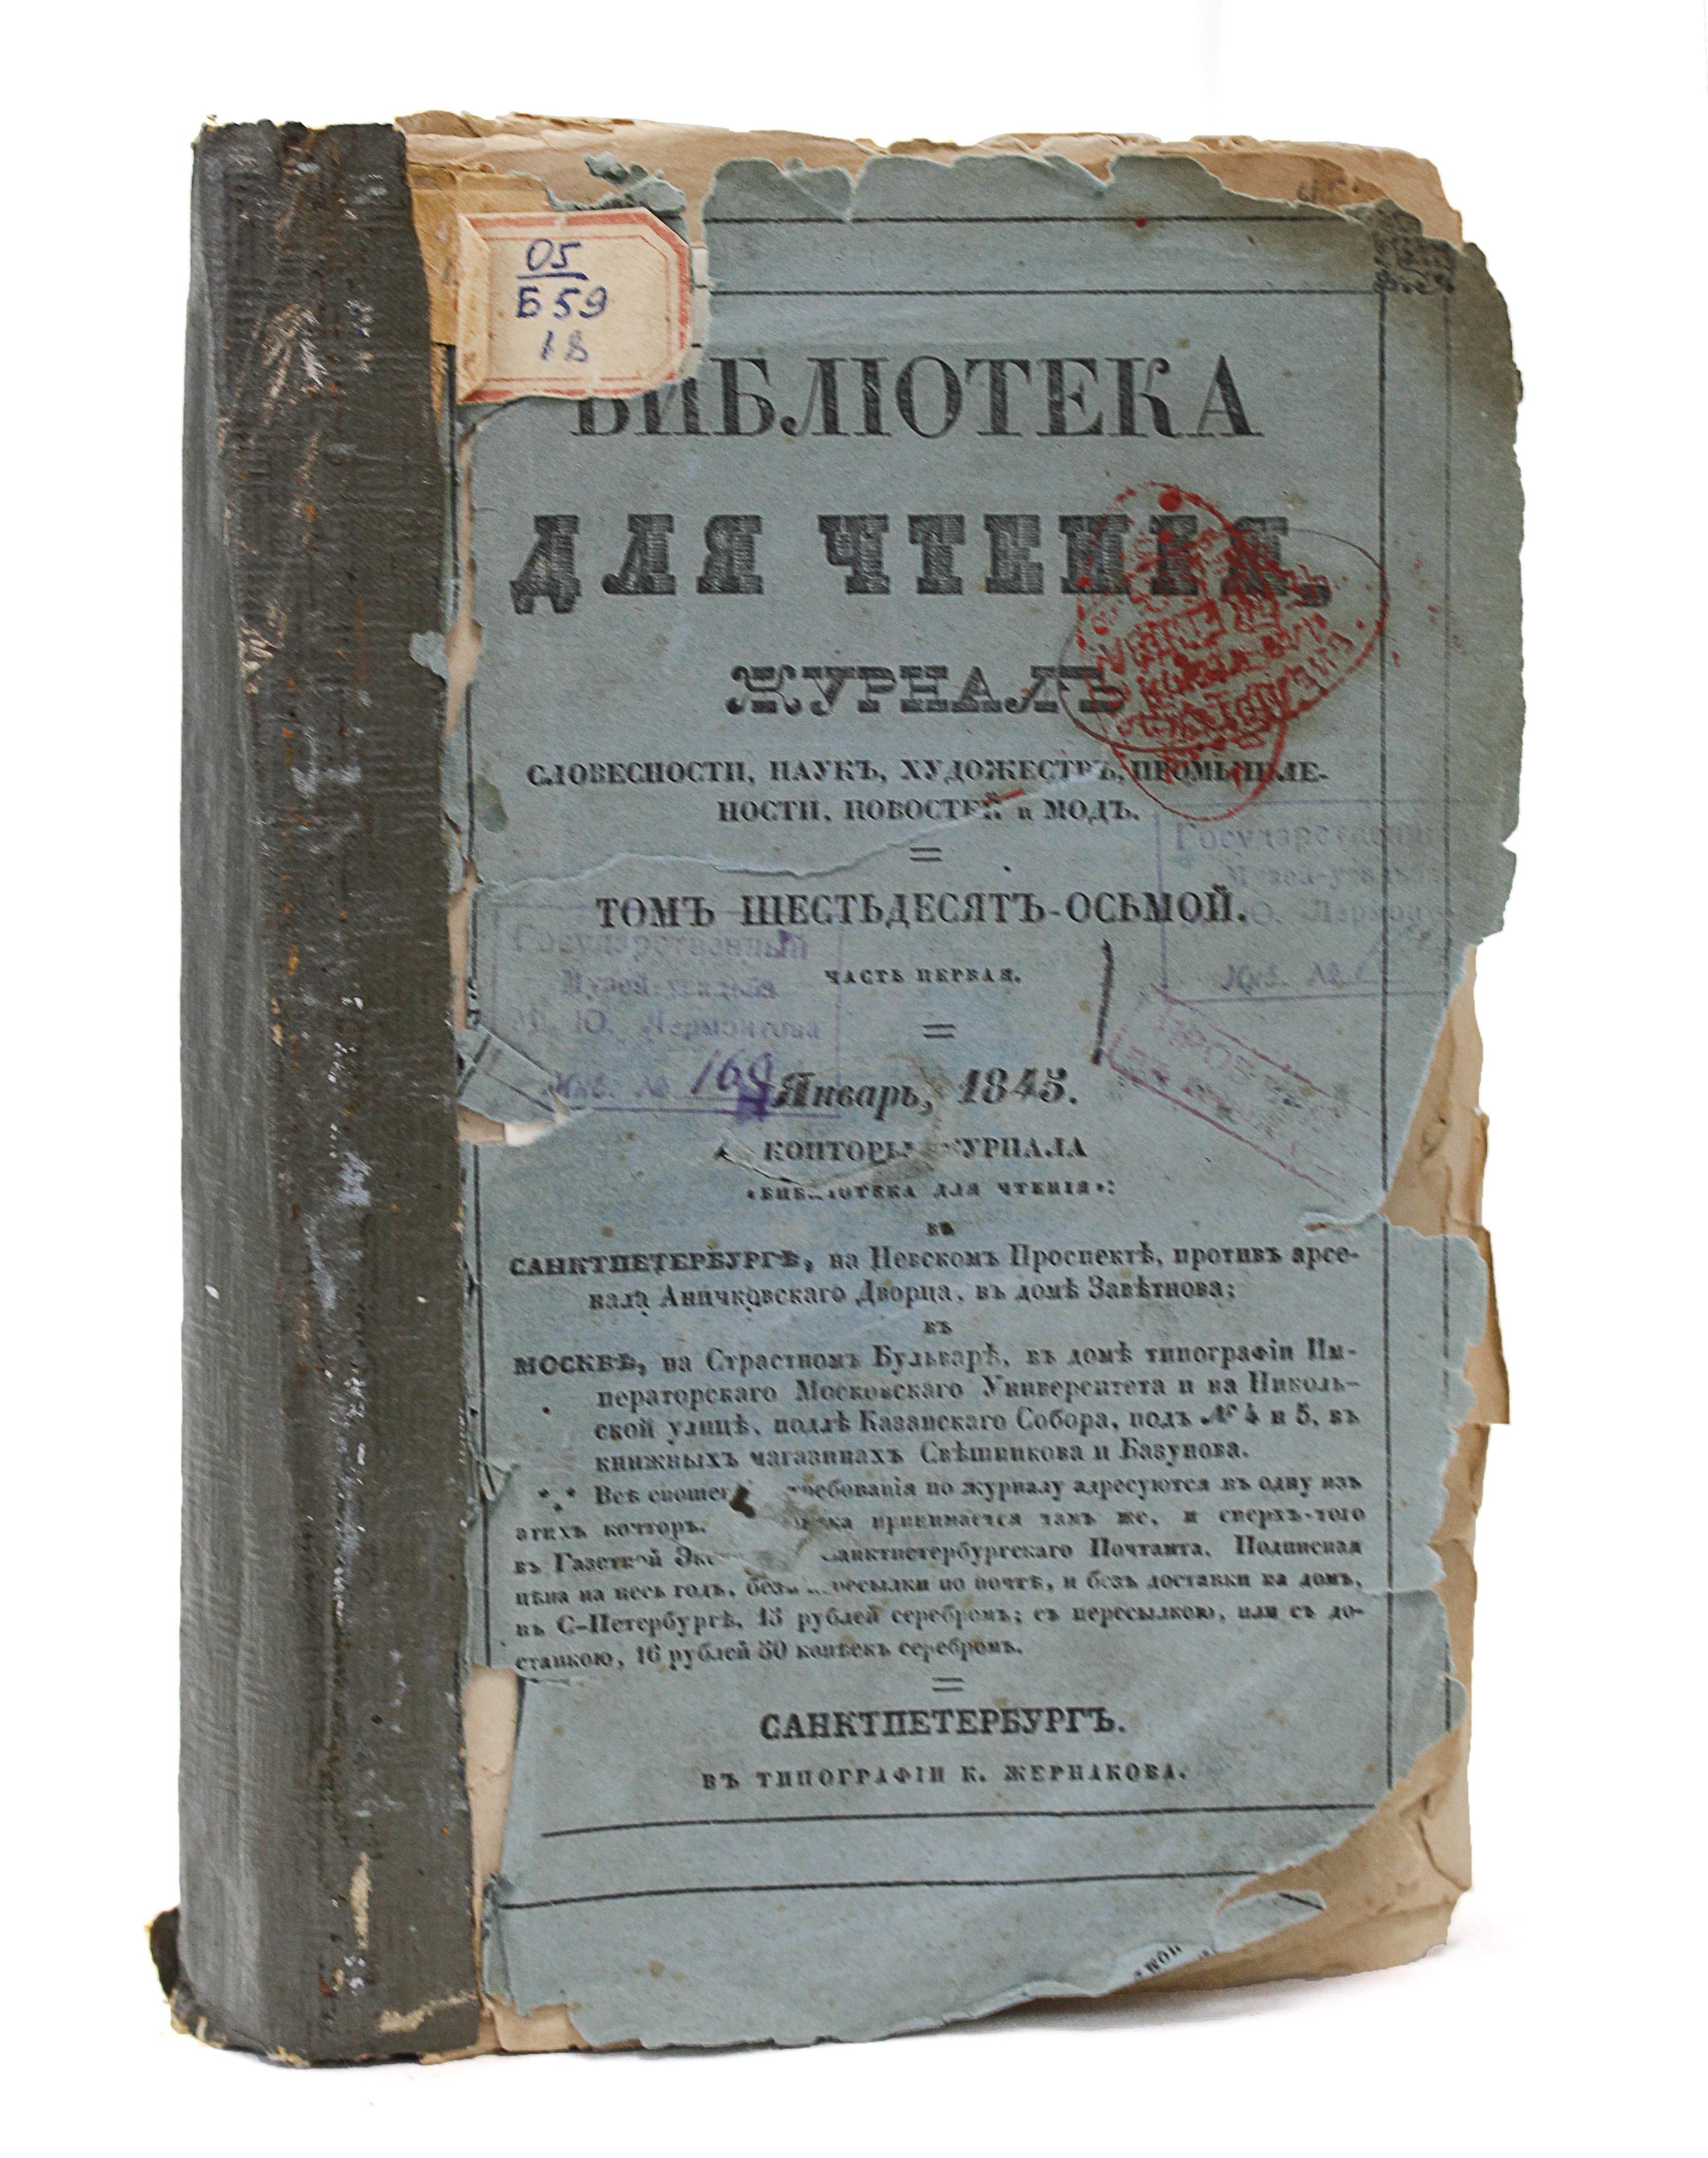 ЛОК-5119 ТАРХАНЫ КП-11026  Журнал Библиотека для чтения. Т. 68._1